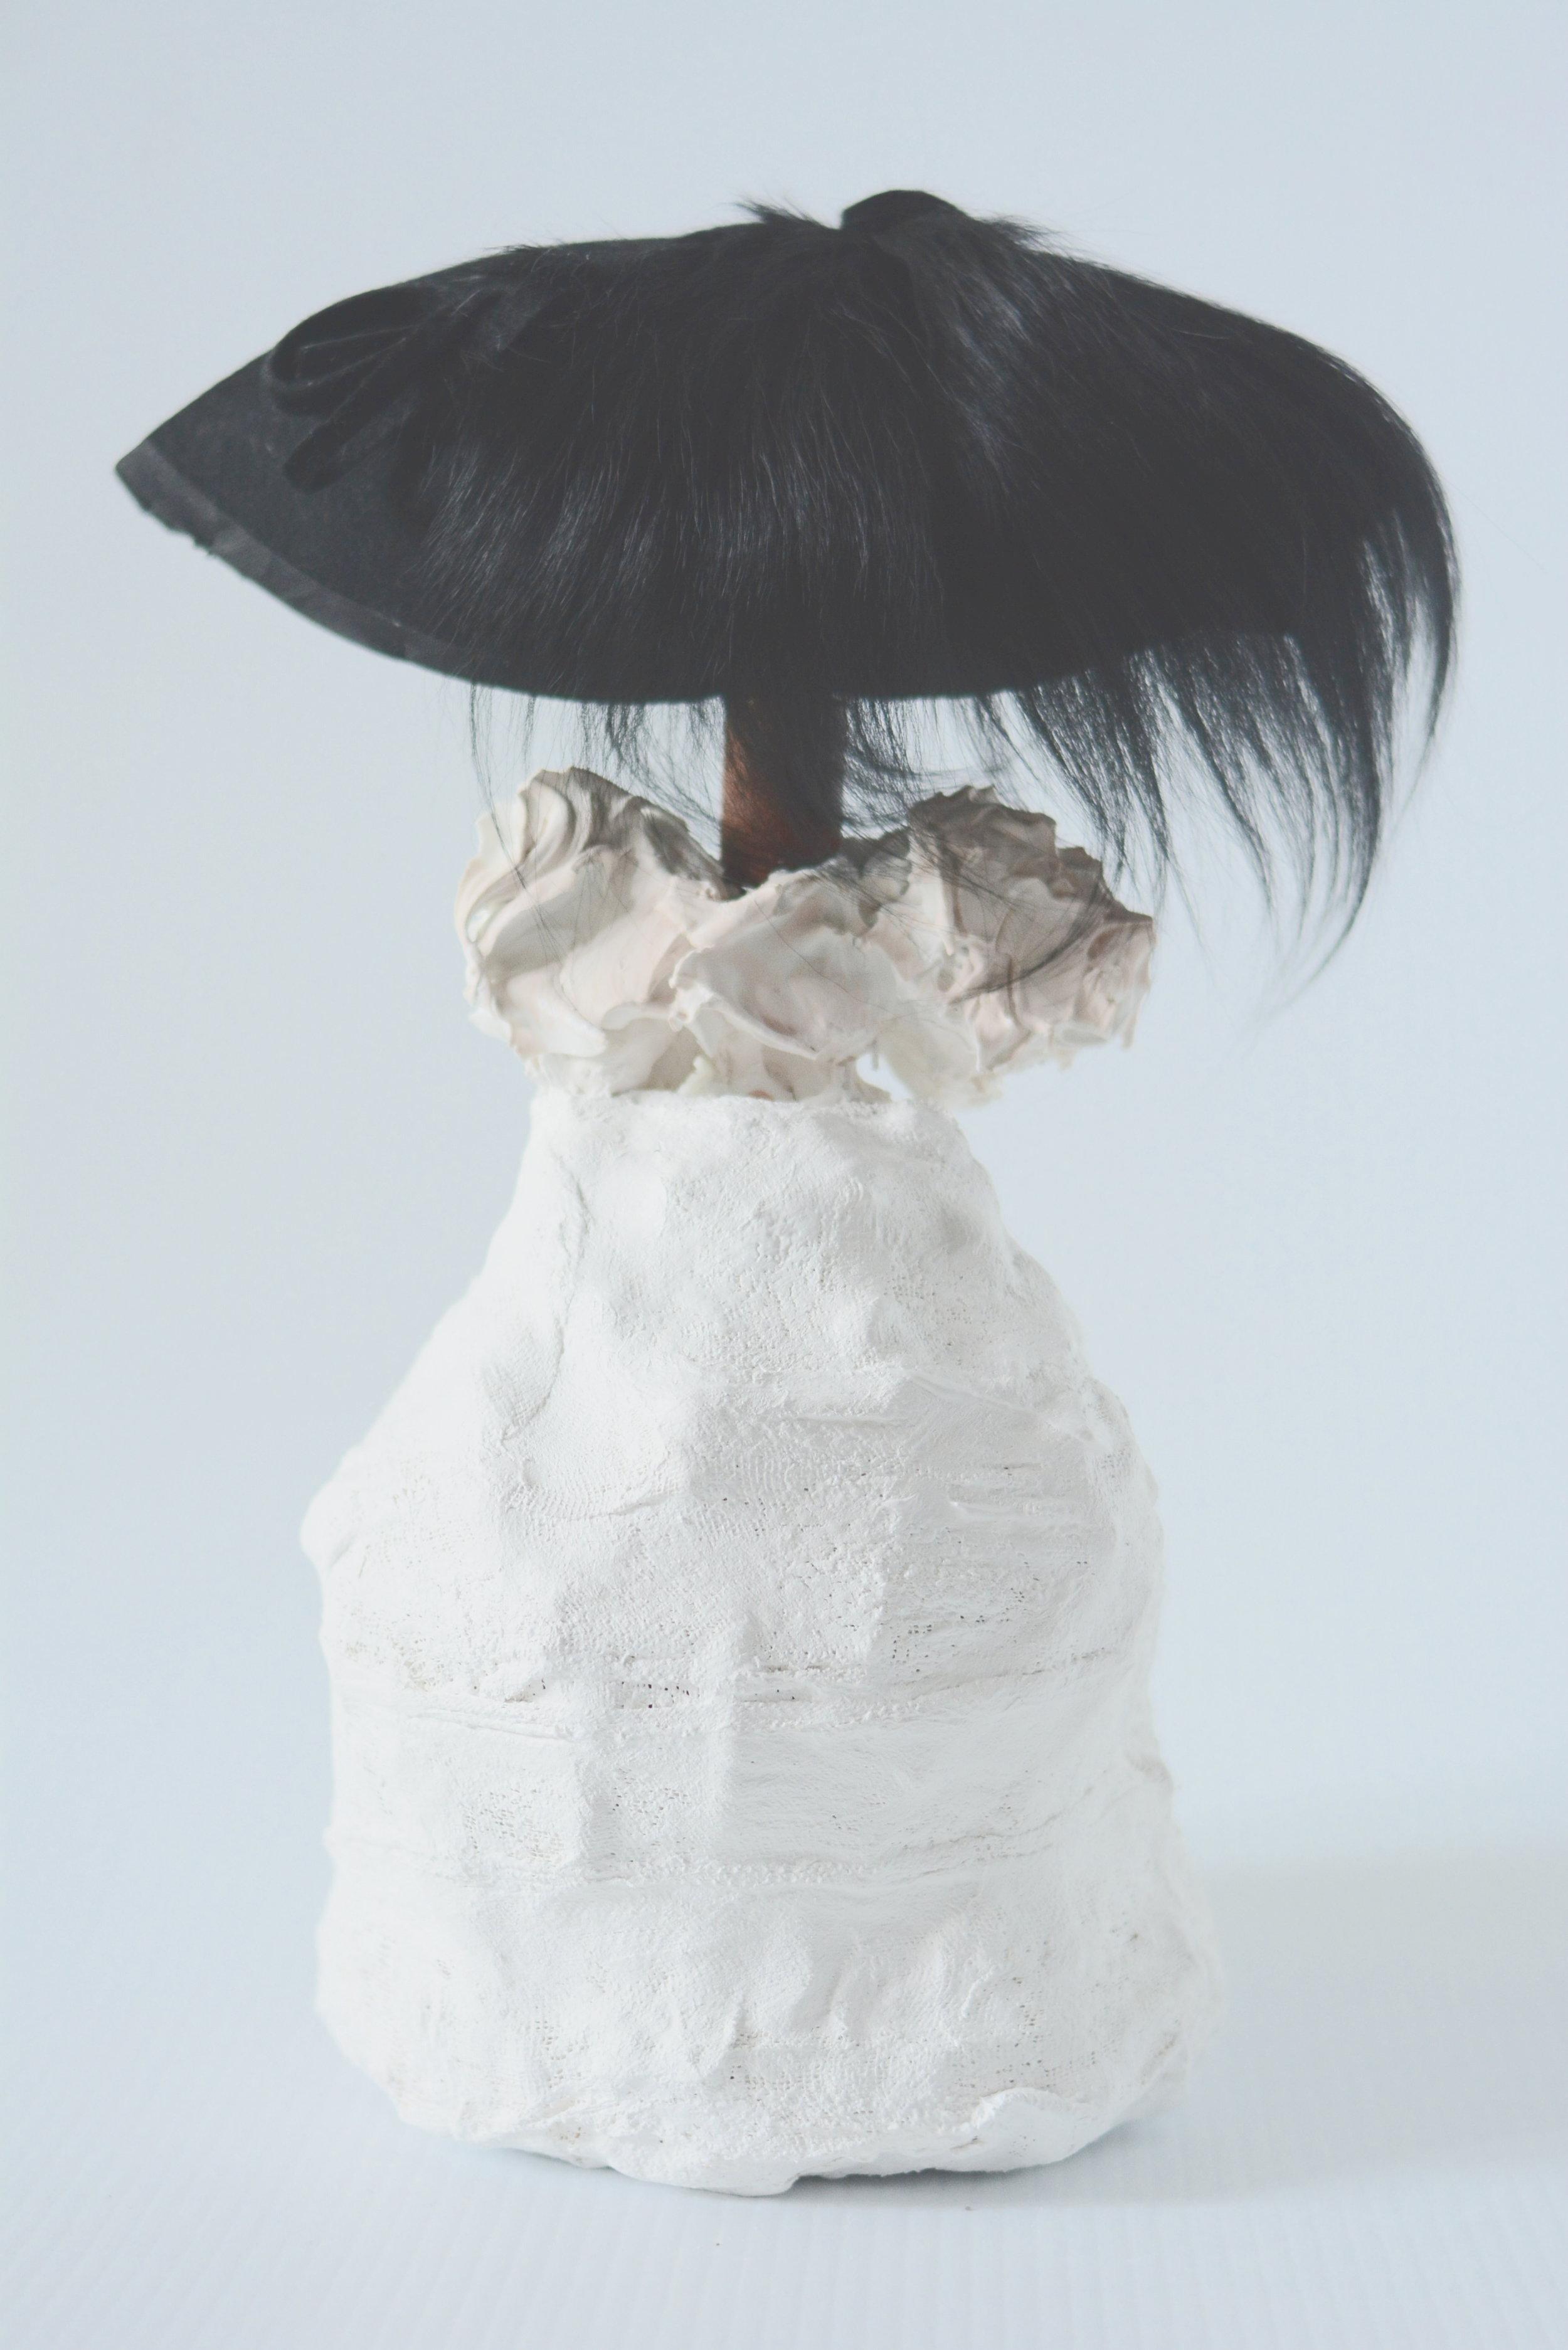 Maryam Keyhani, Safe Under My Heart_Epoxy,Plaster, foam, paint, vintafe hat_38x28x20cm.JPG